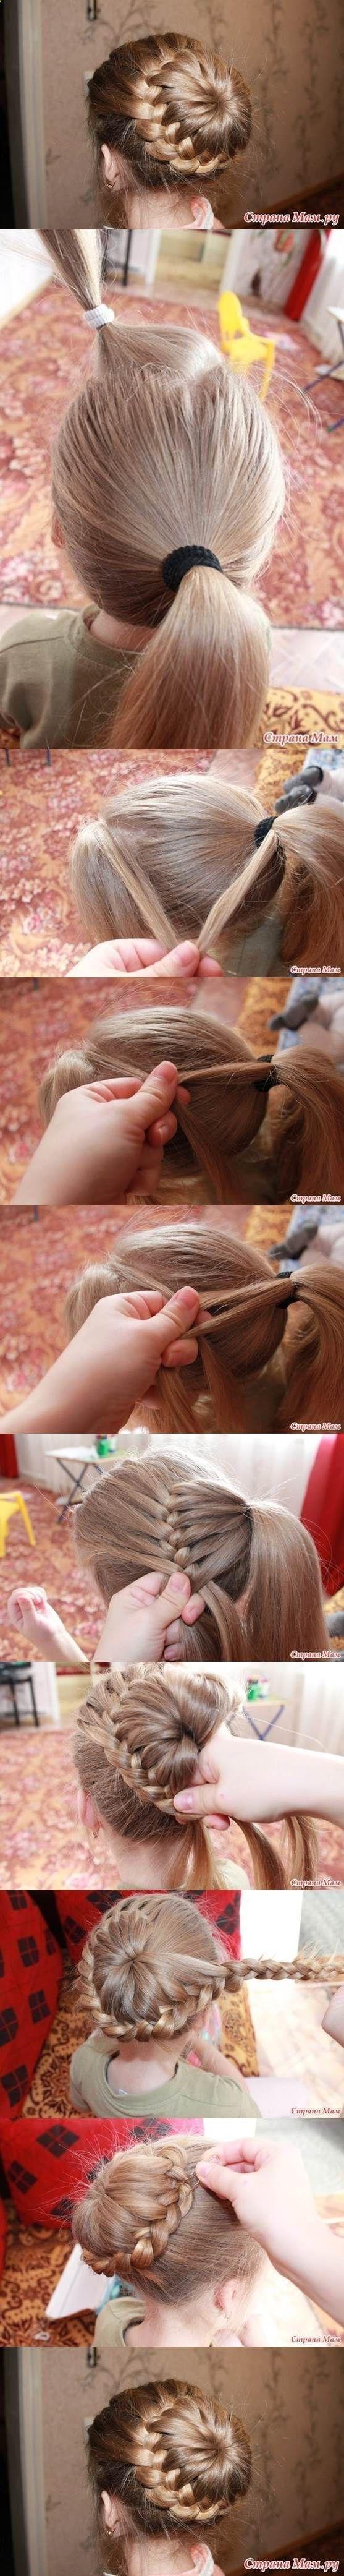 #braided #braids #around #weave #every #tail #girl #how #can #try #bun #toHow to Weave Braids Around...